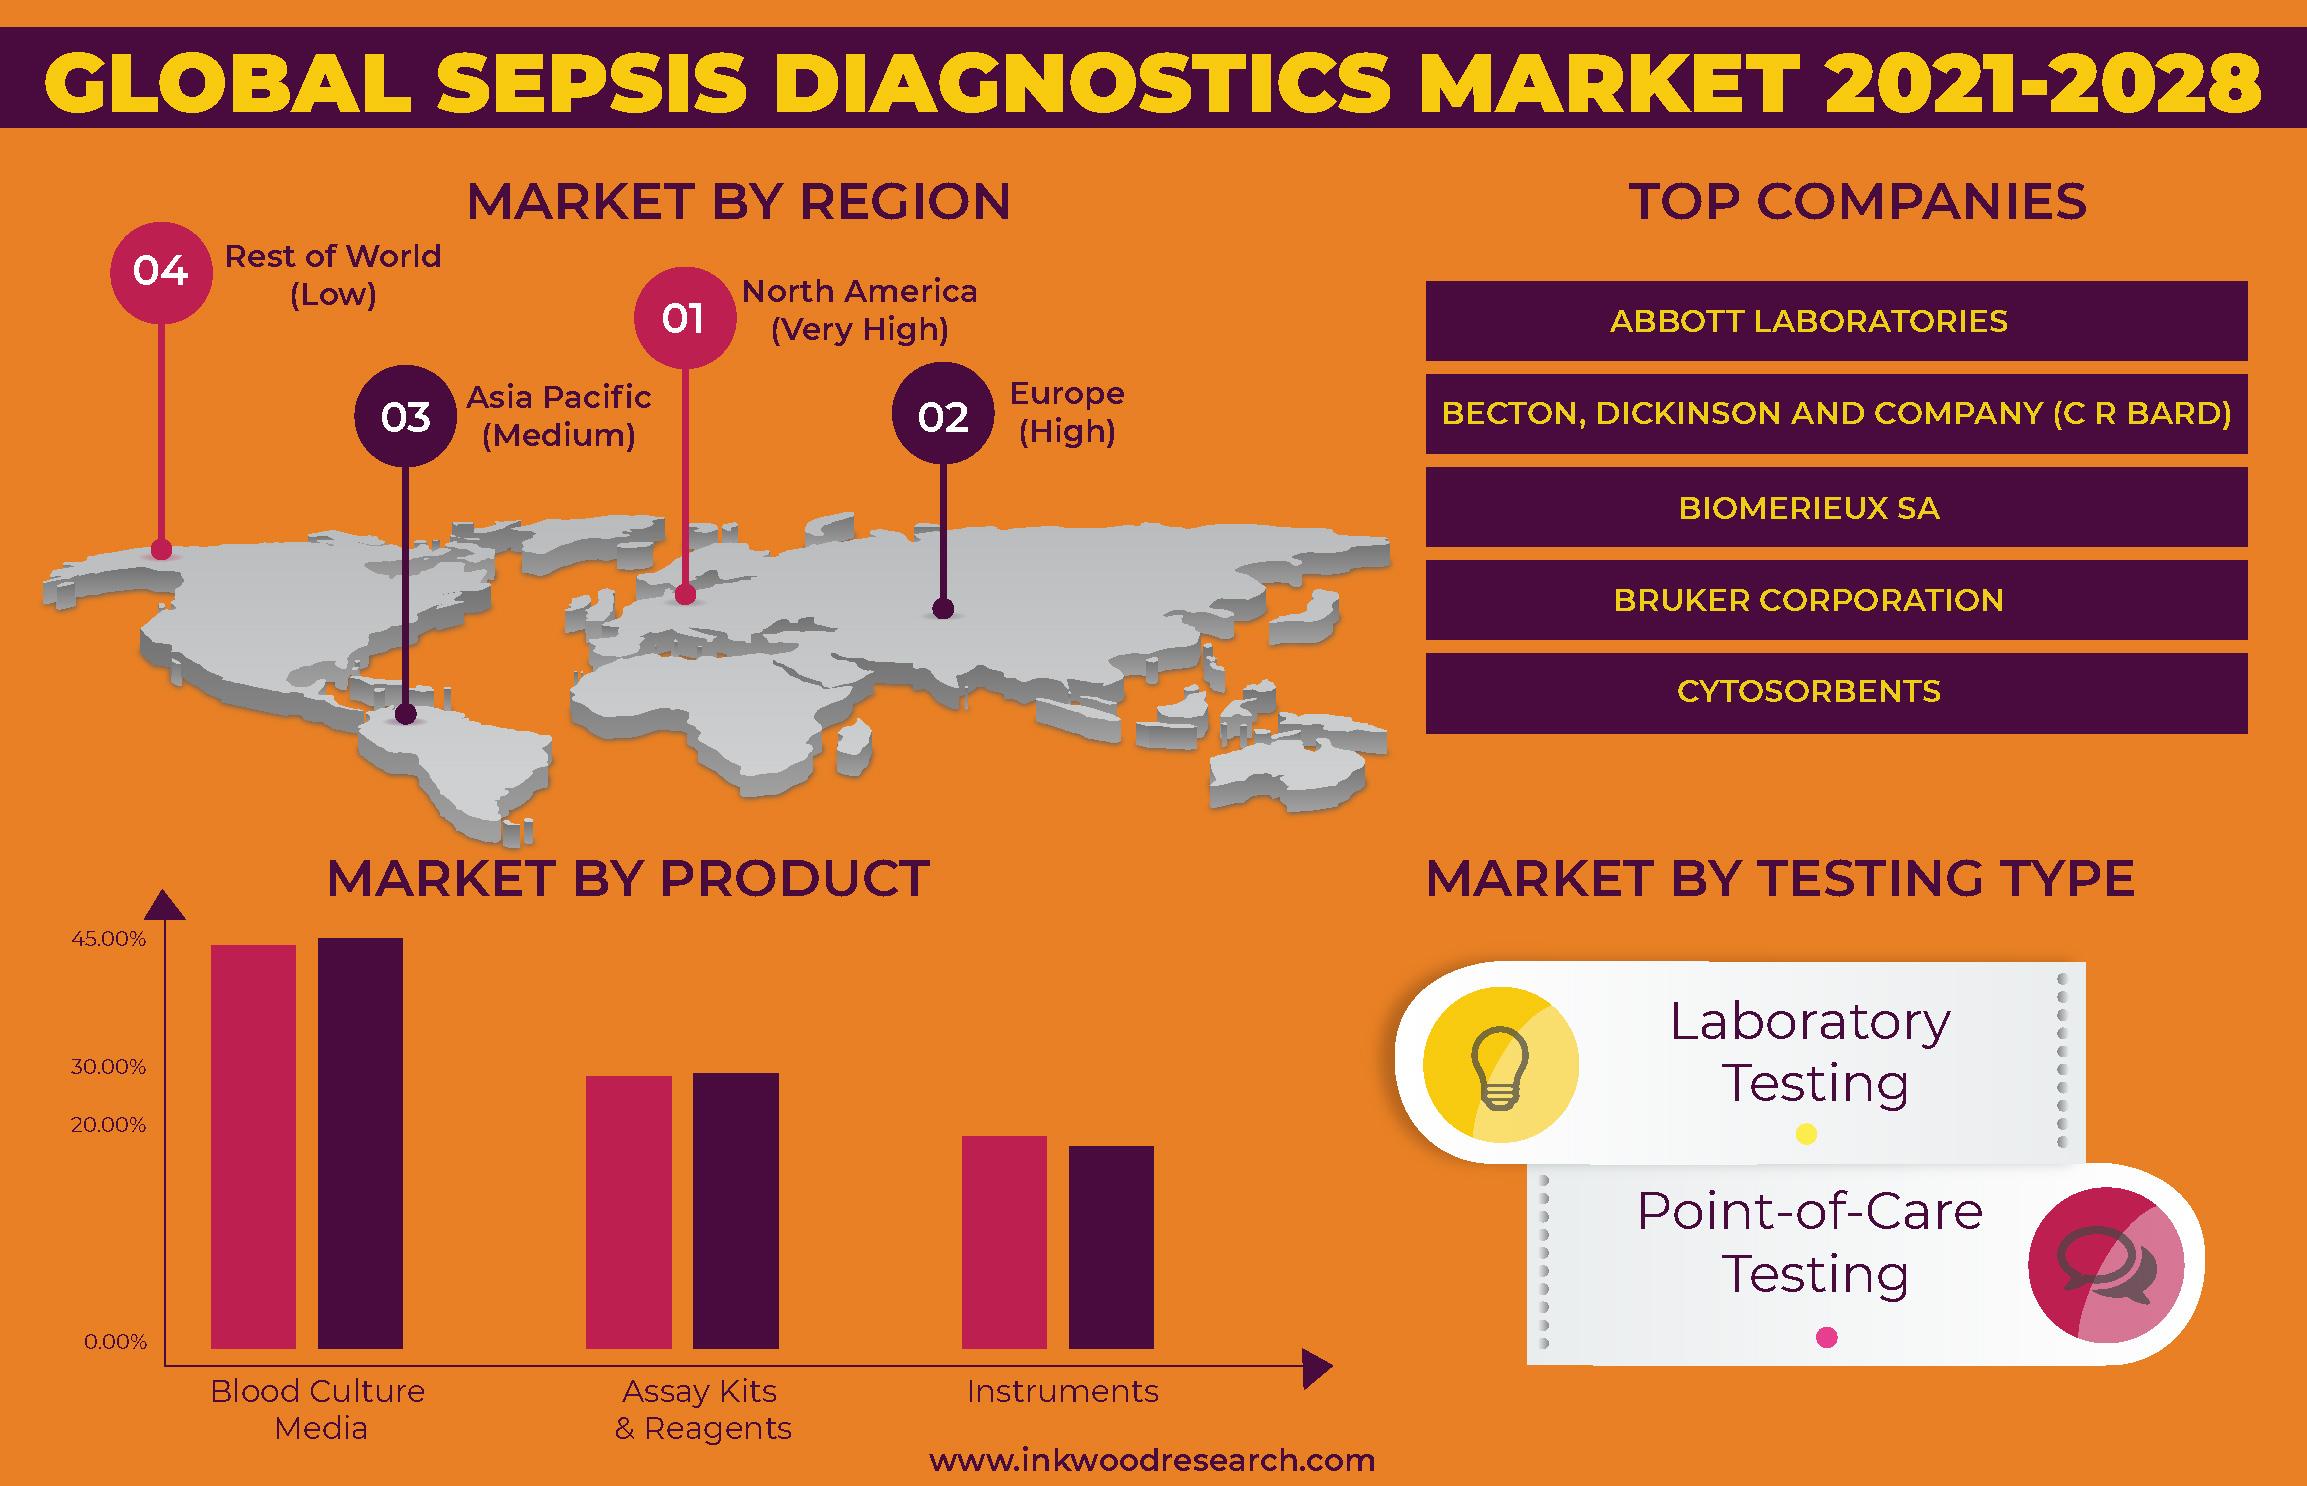 Burden of Sepsis is boosting Diagnostics Advances in the Global Market